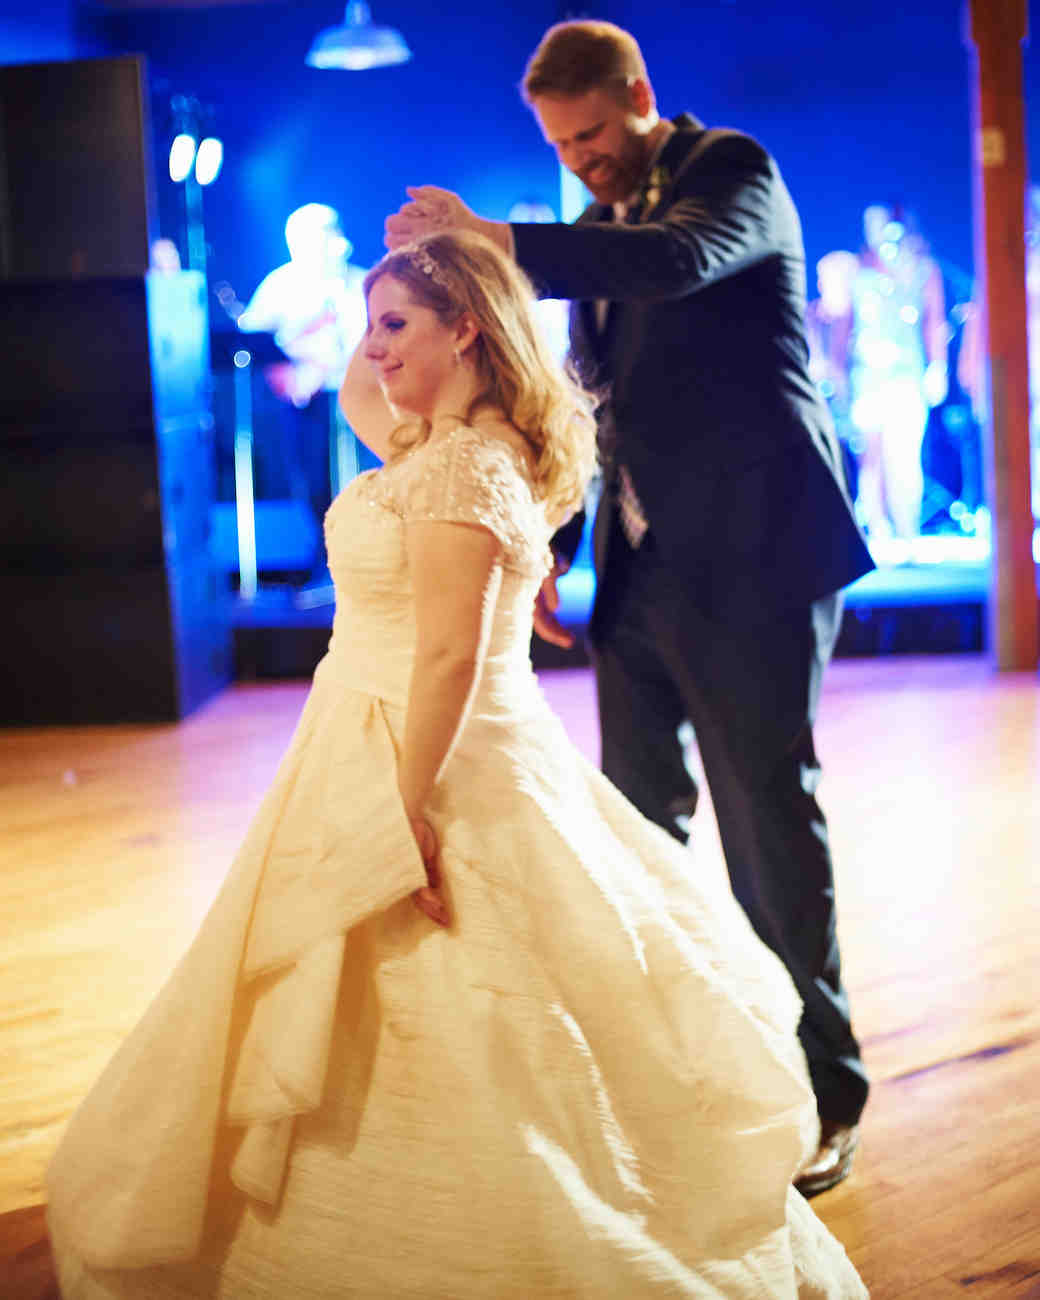 maddy-mike-wedding-firstdance-748.d3s.251.2015.49-6134174-0716.jpg